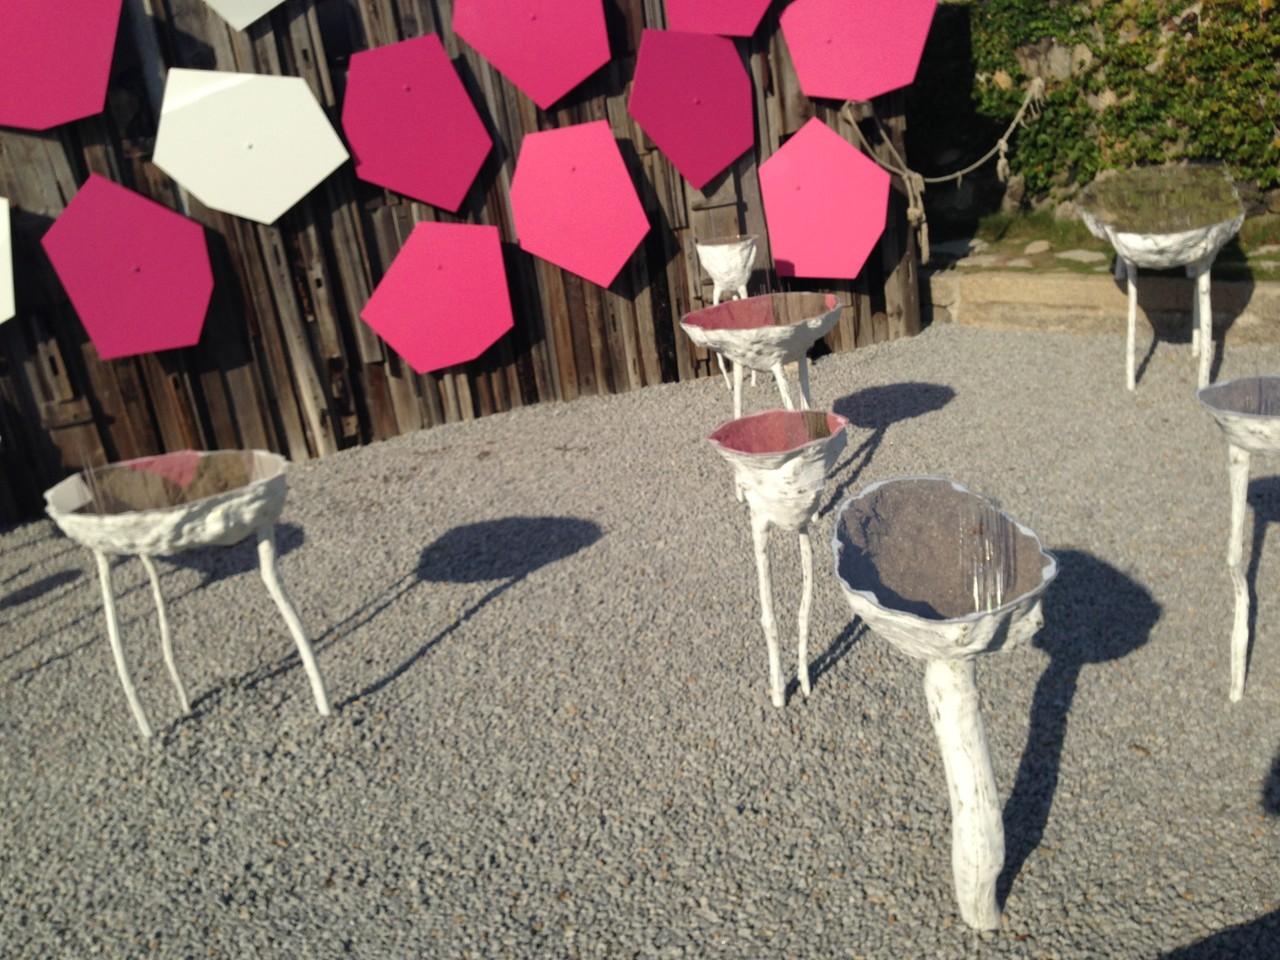 MEGI HOUSE 愛知県立芸術大学瀬戸内アートプロジェクトチーム  の作品